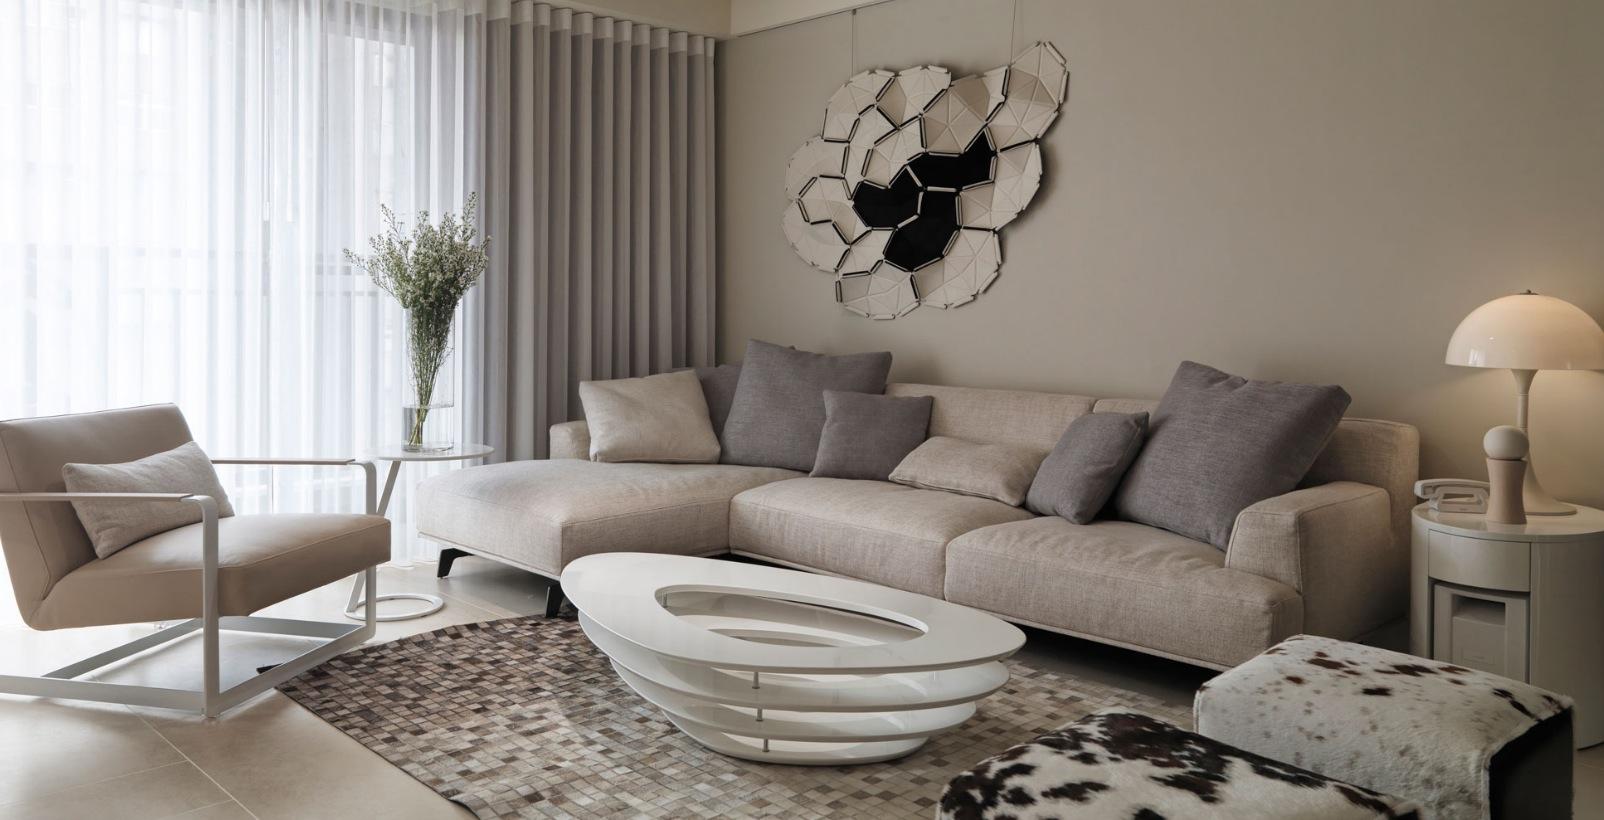 Wandfarben grau kombinieren